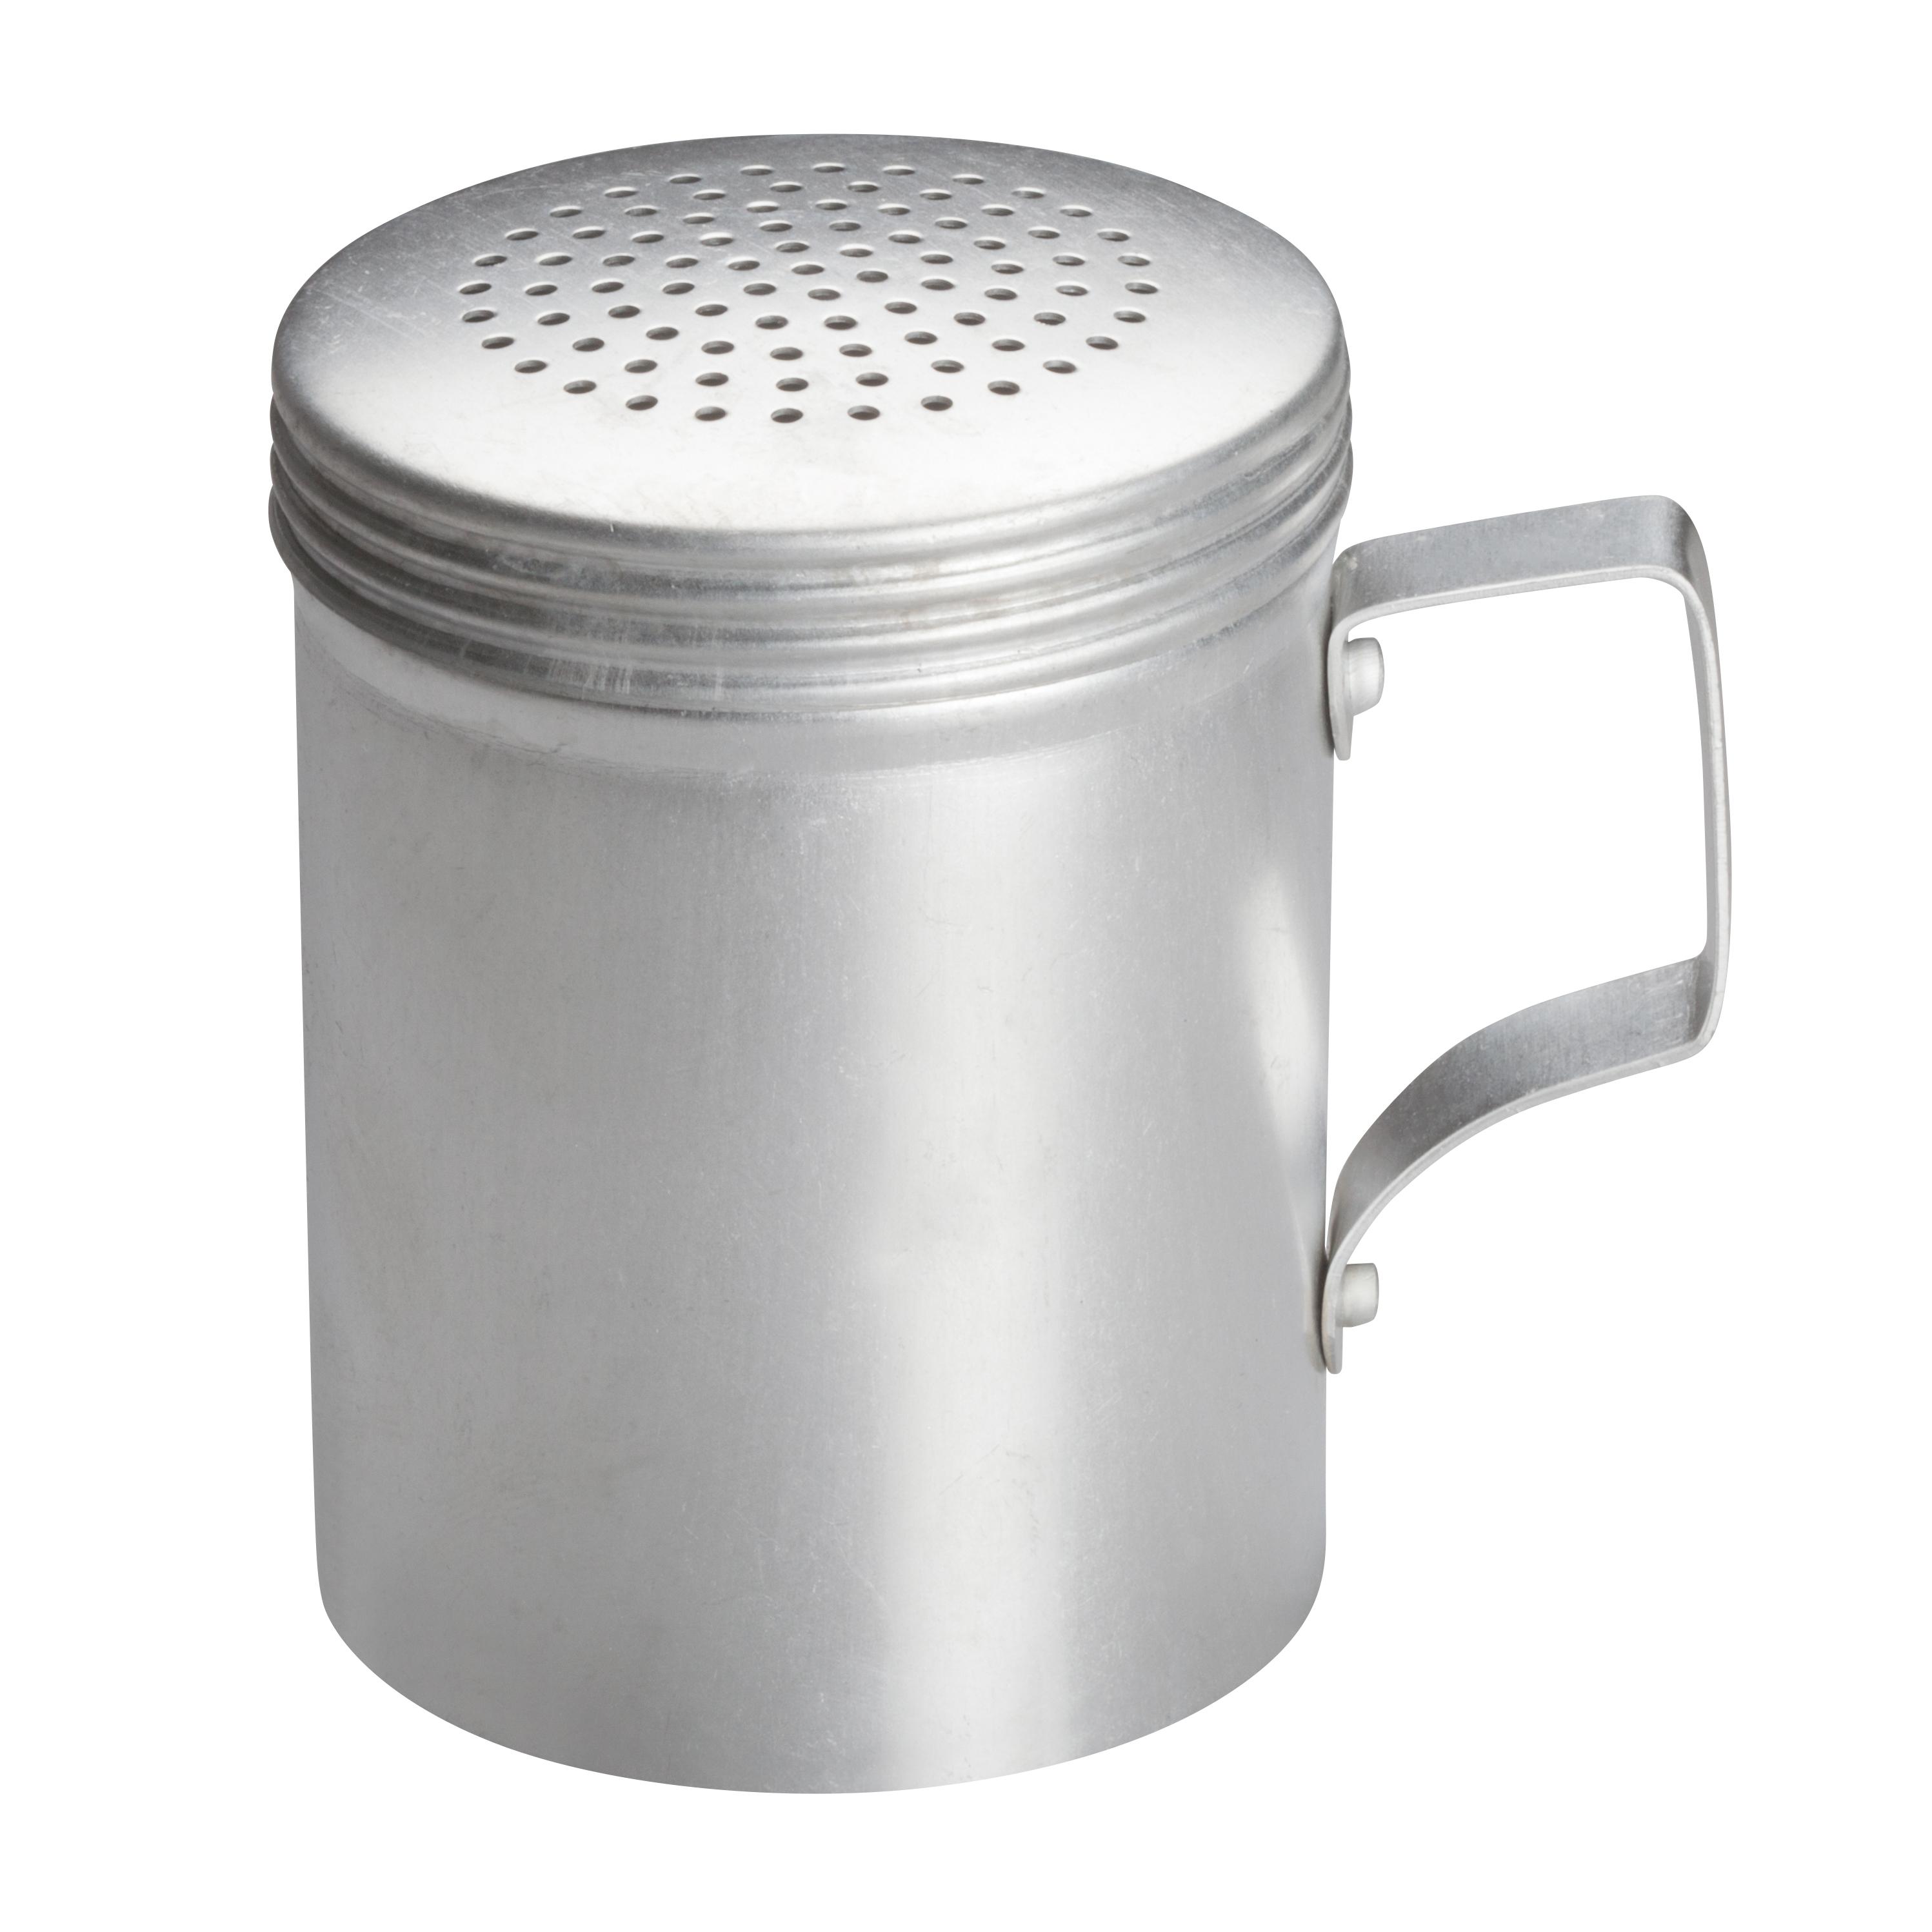 Winco ADRG-10 shaker / dredge